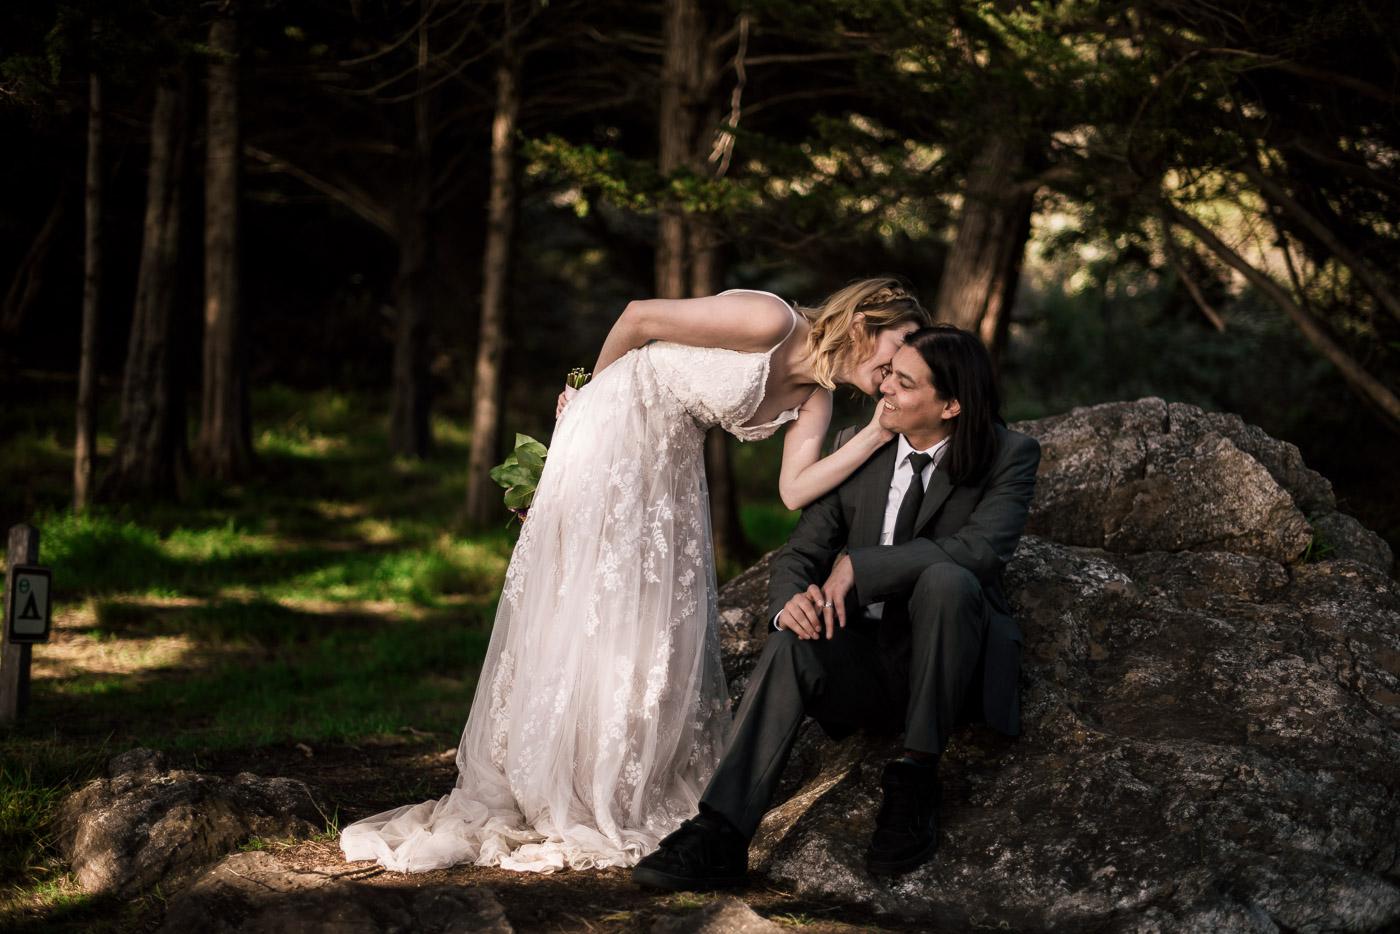 Loving bride whispers in her husbands ear.